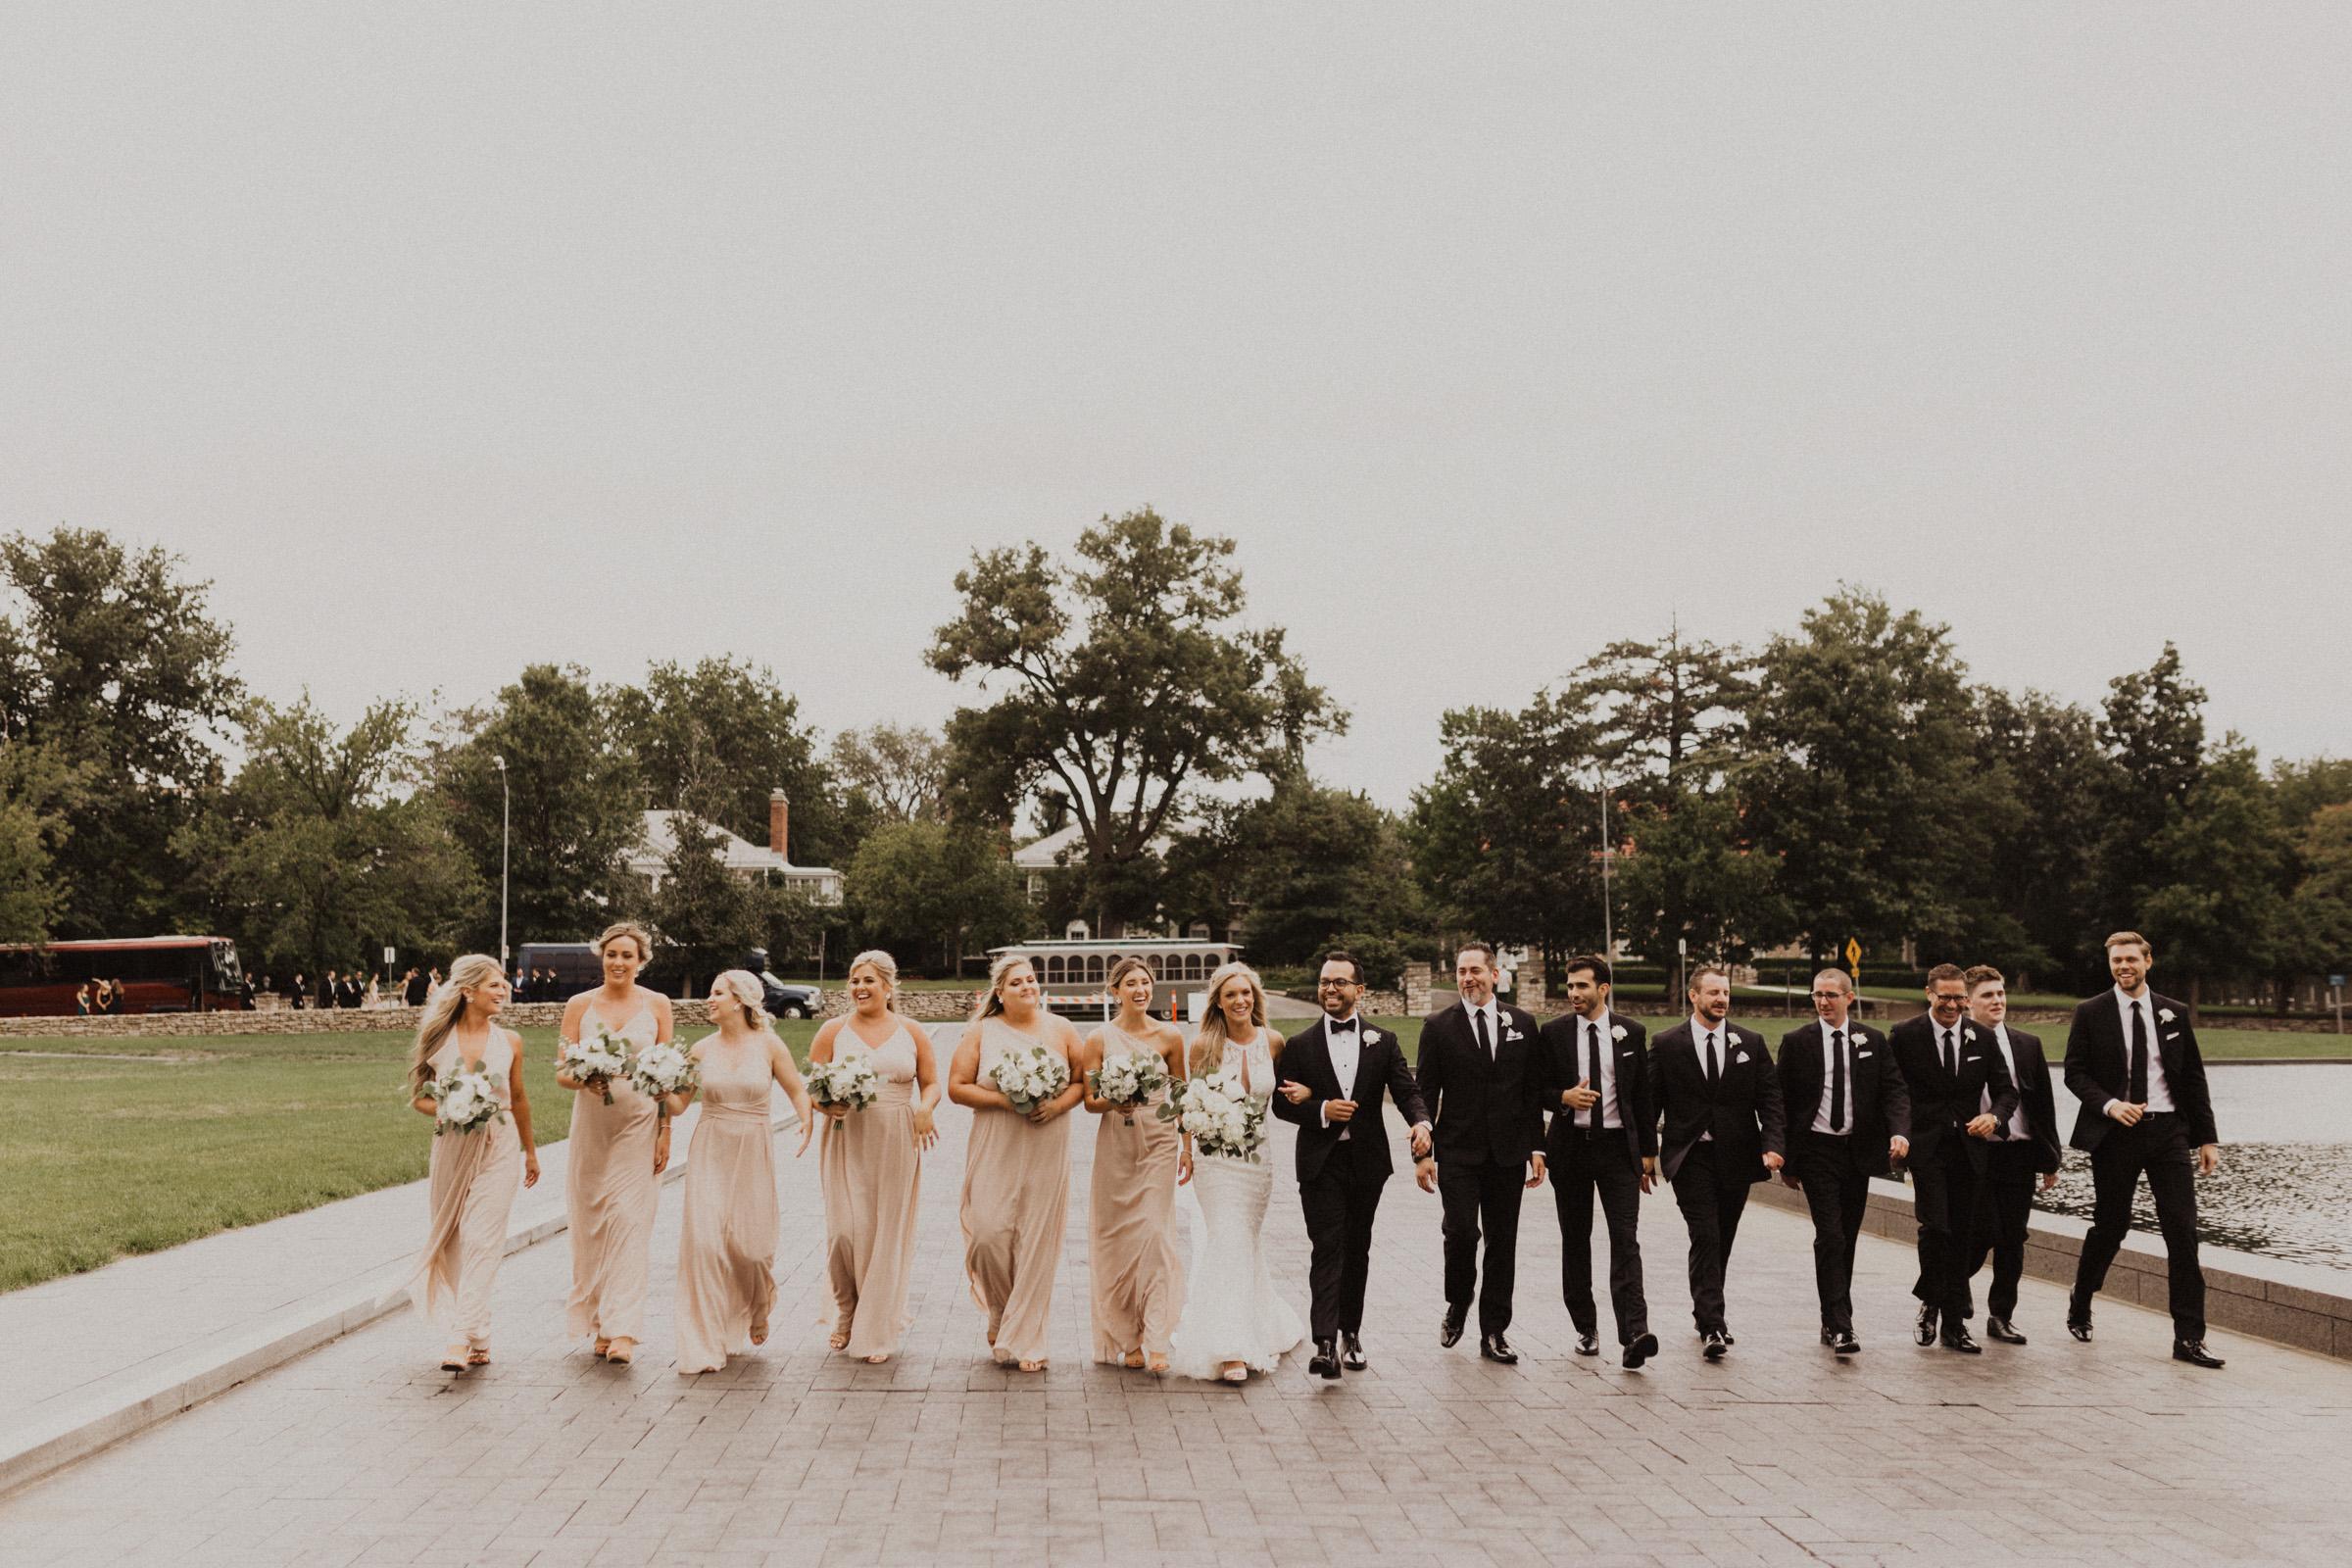 alyssa barletter photography downtown kansas city cherry hall summer wedding photographer-23.jpg